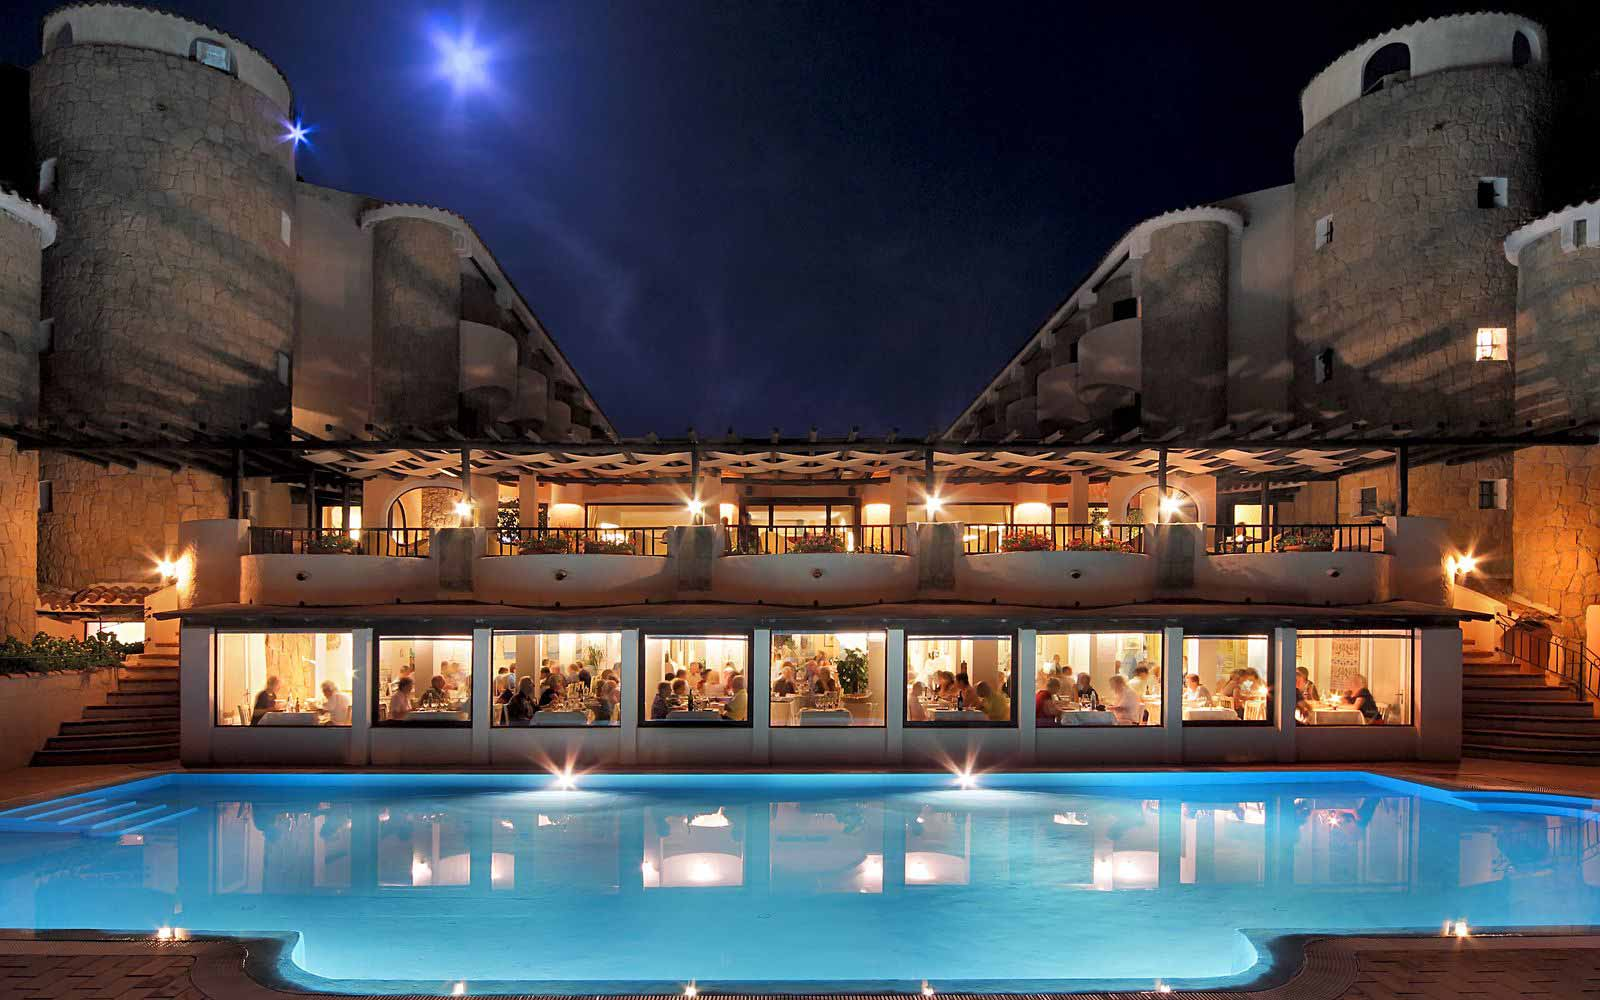 Swimming pool by night at Grand Hotel Smeraldo Beach